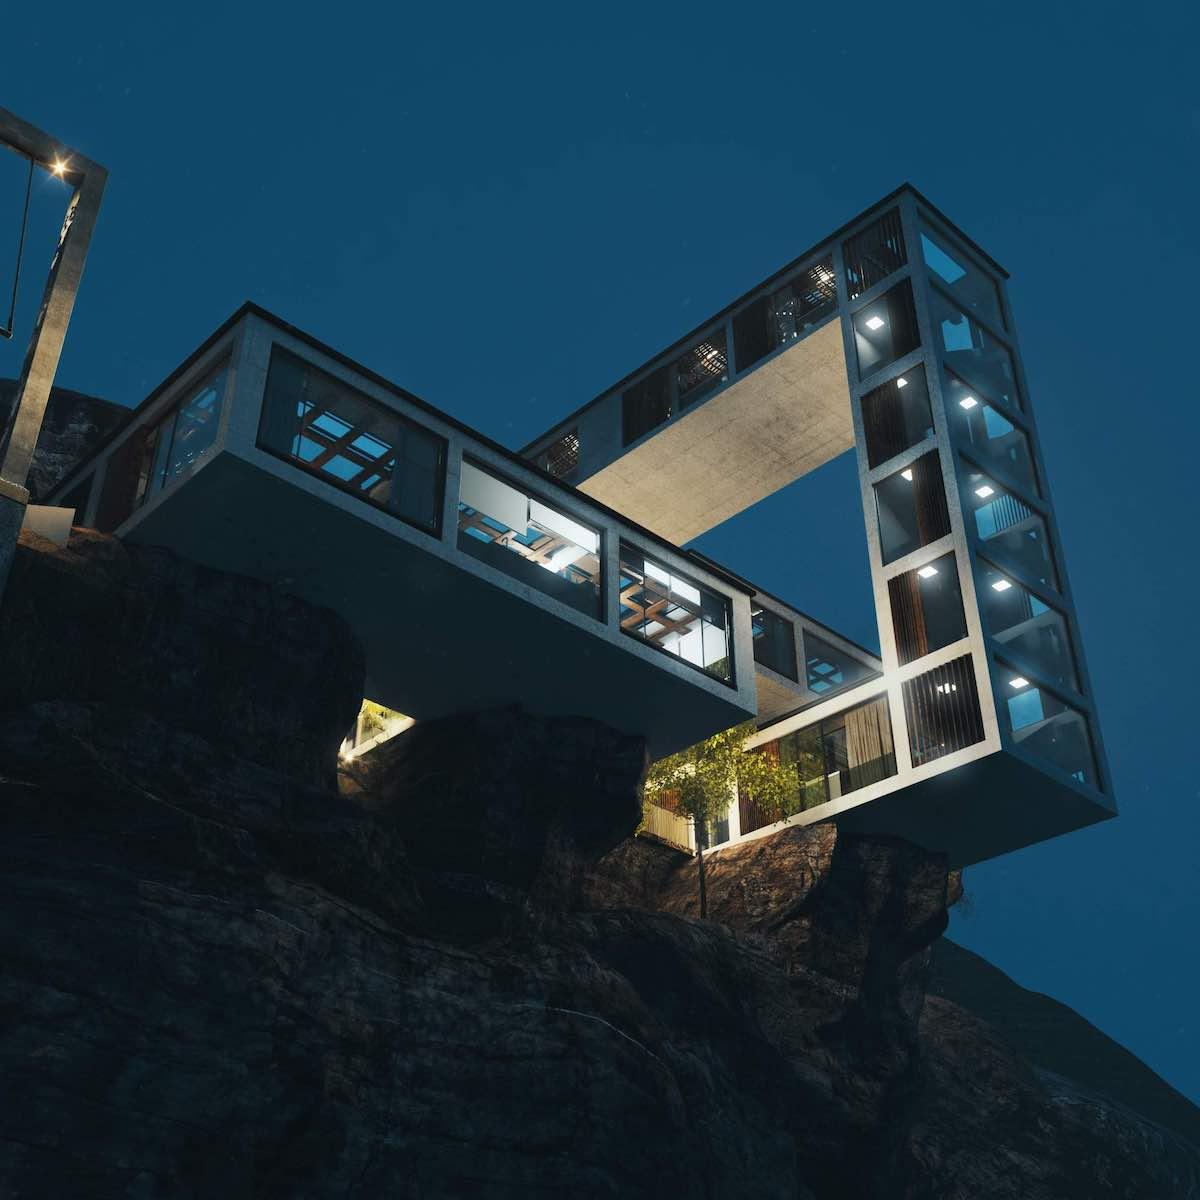 Night View of Milad Eshtiyaghi's Mountain House